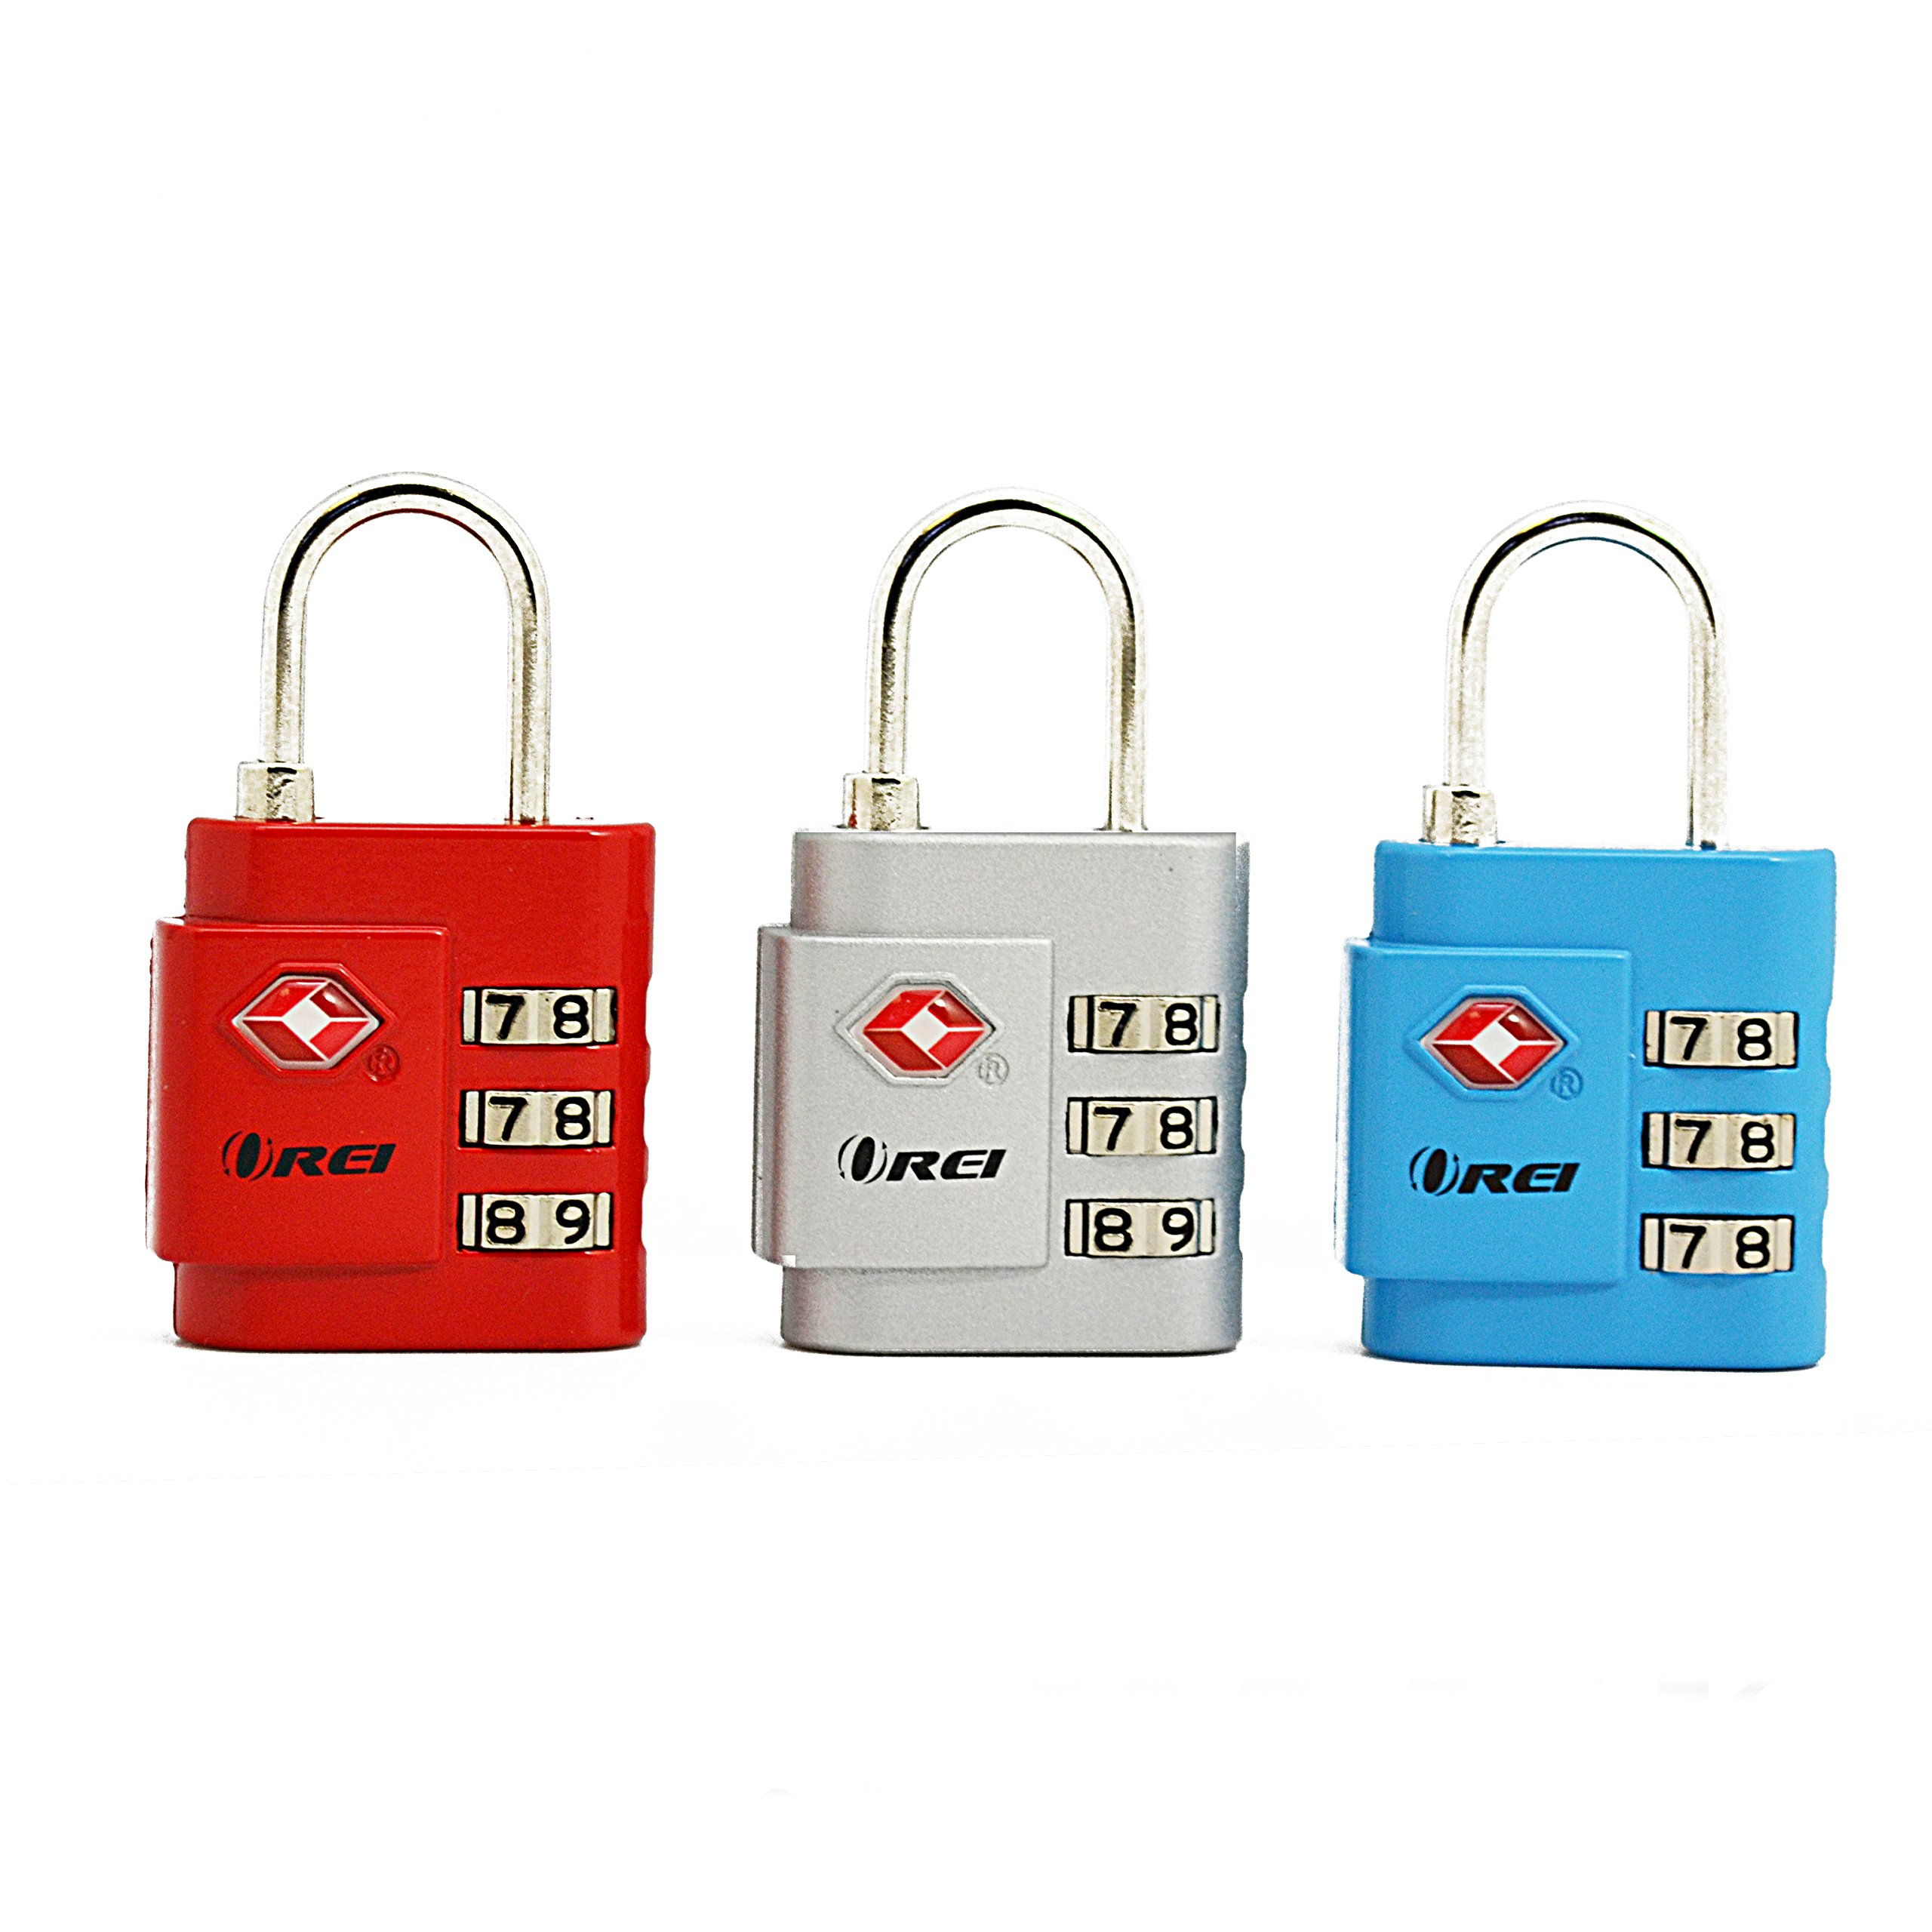 OREI TSA Approved Luggage Locks Set - Combination Travel Lock Quality (3 Pack)